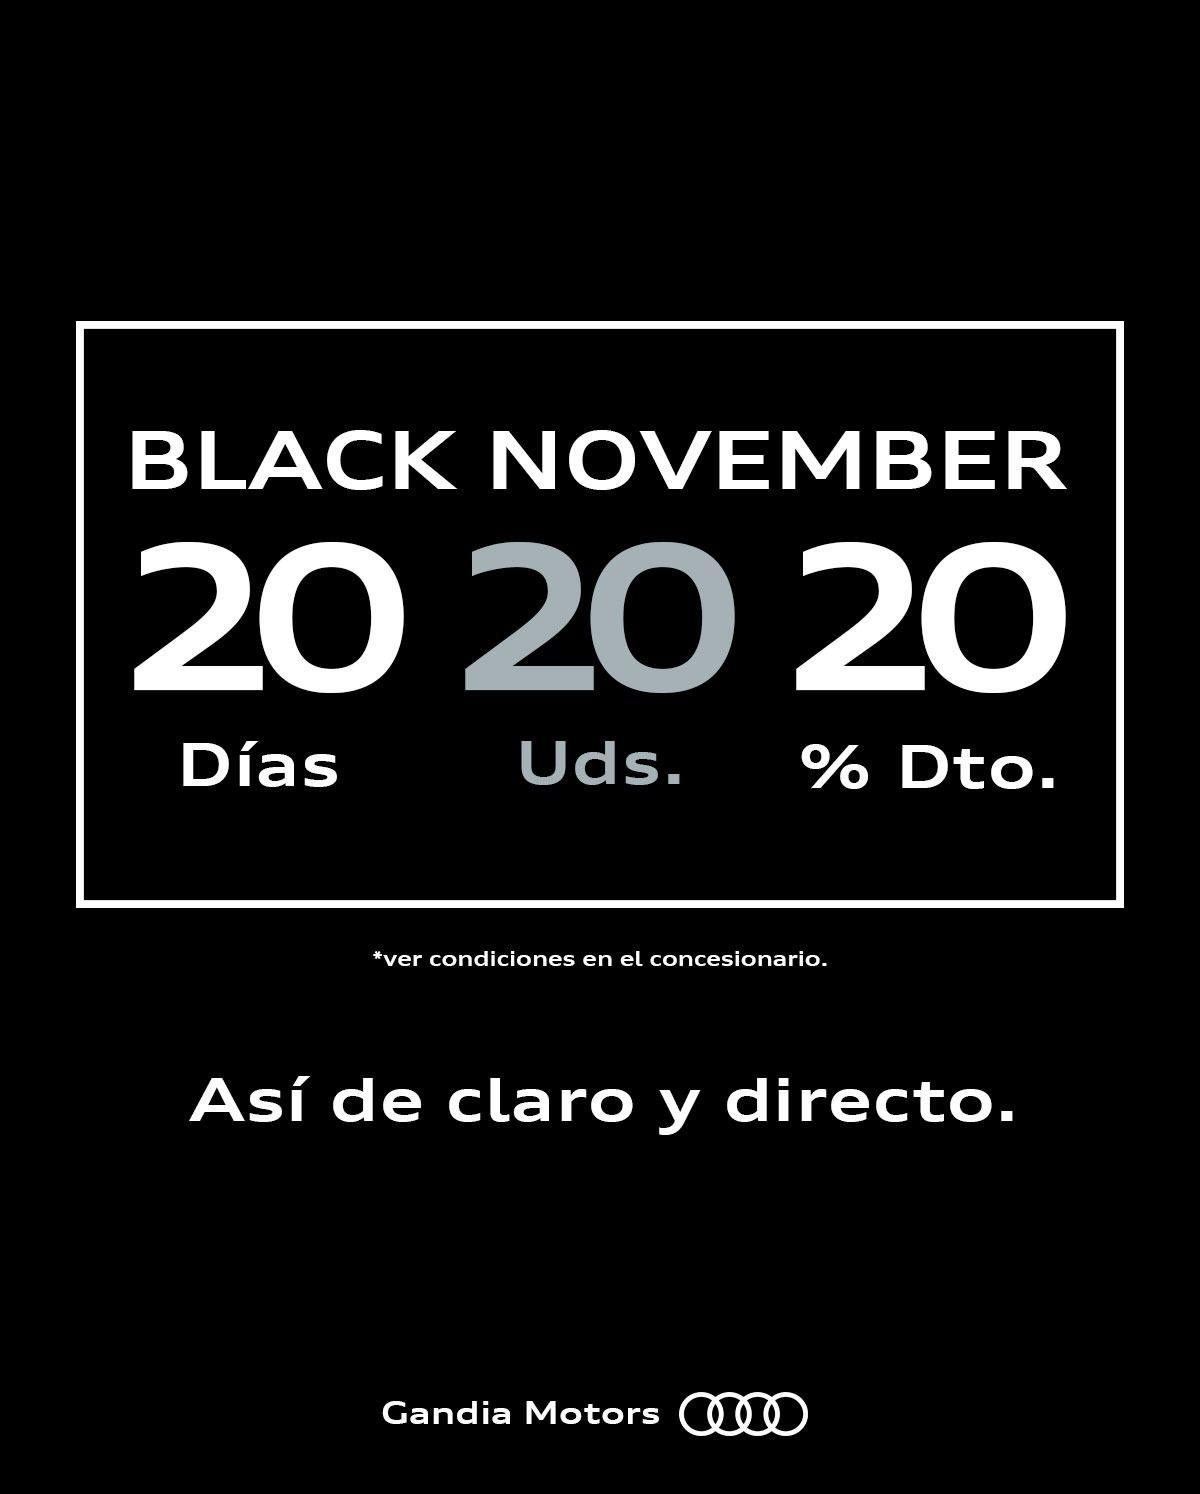 Black November en Audi Gandia Motors